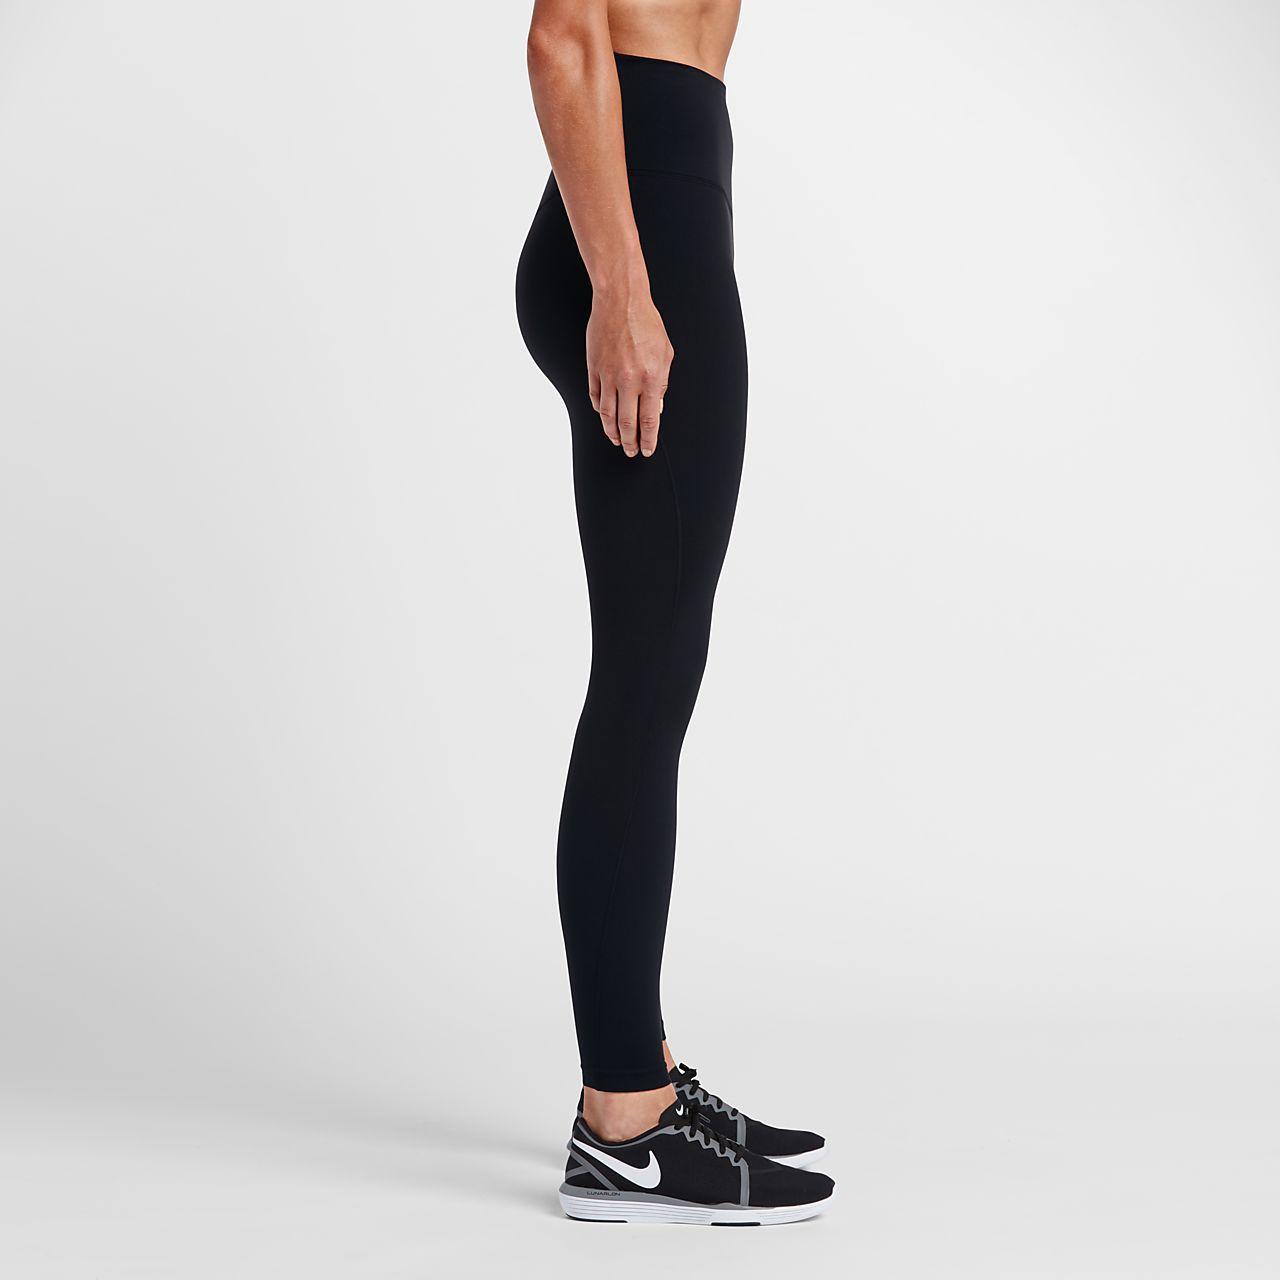 931244f826 Nike Power Legendary Women's 28\